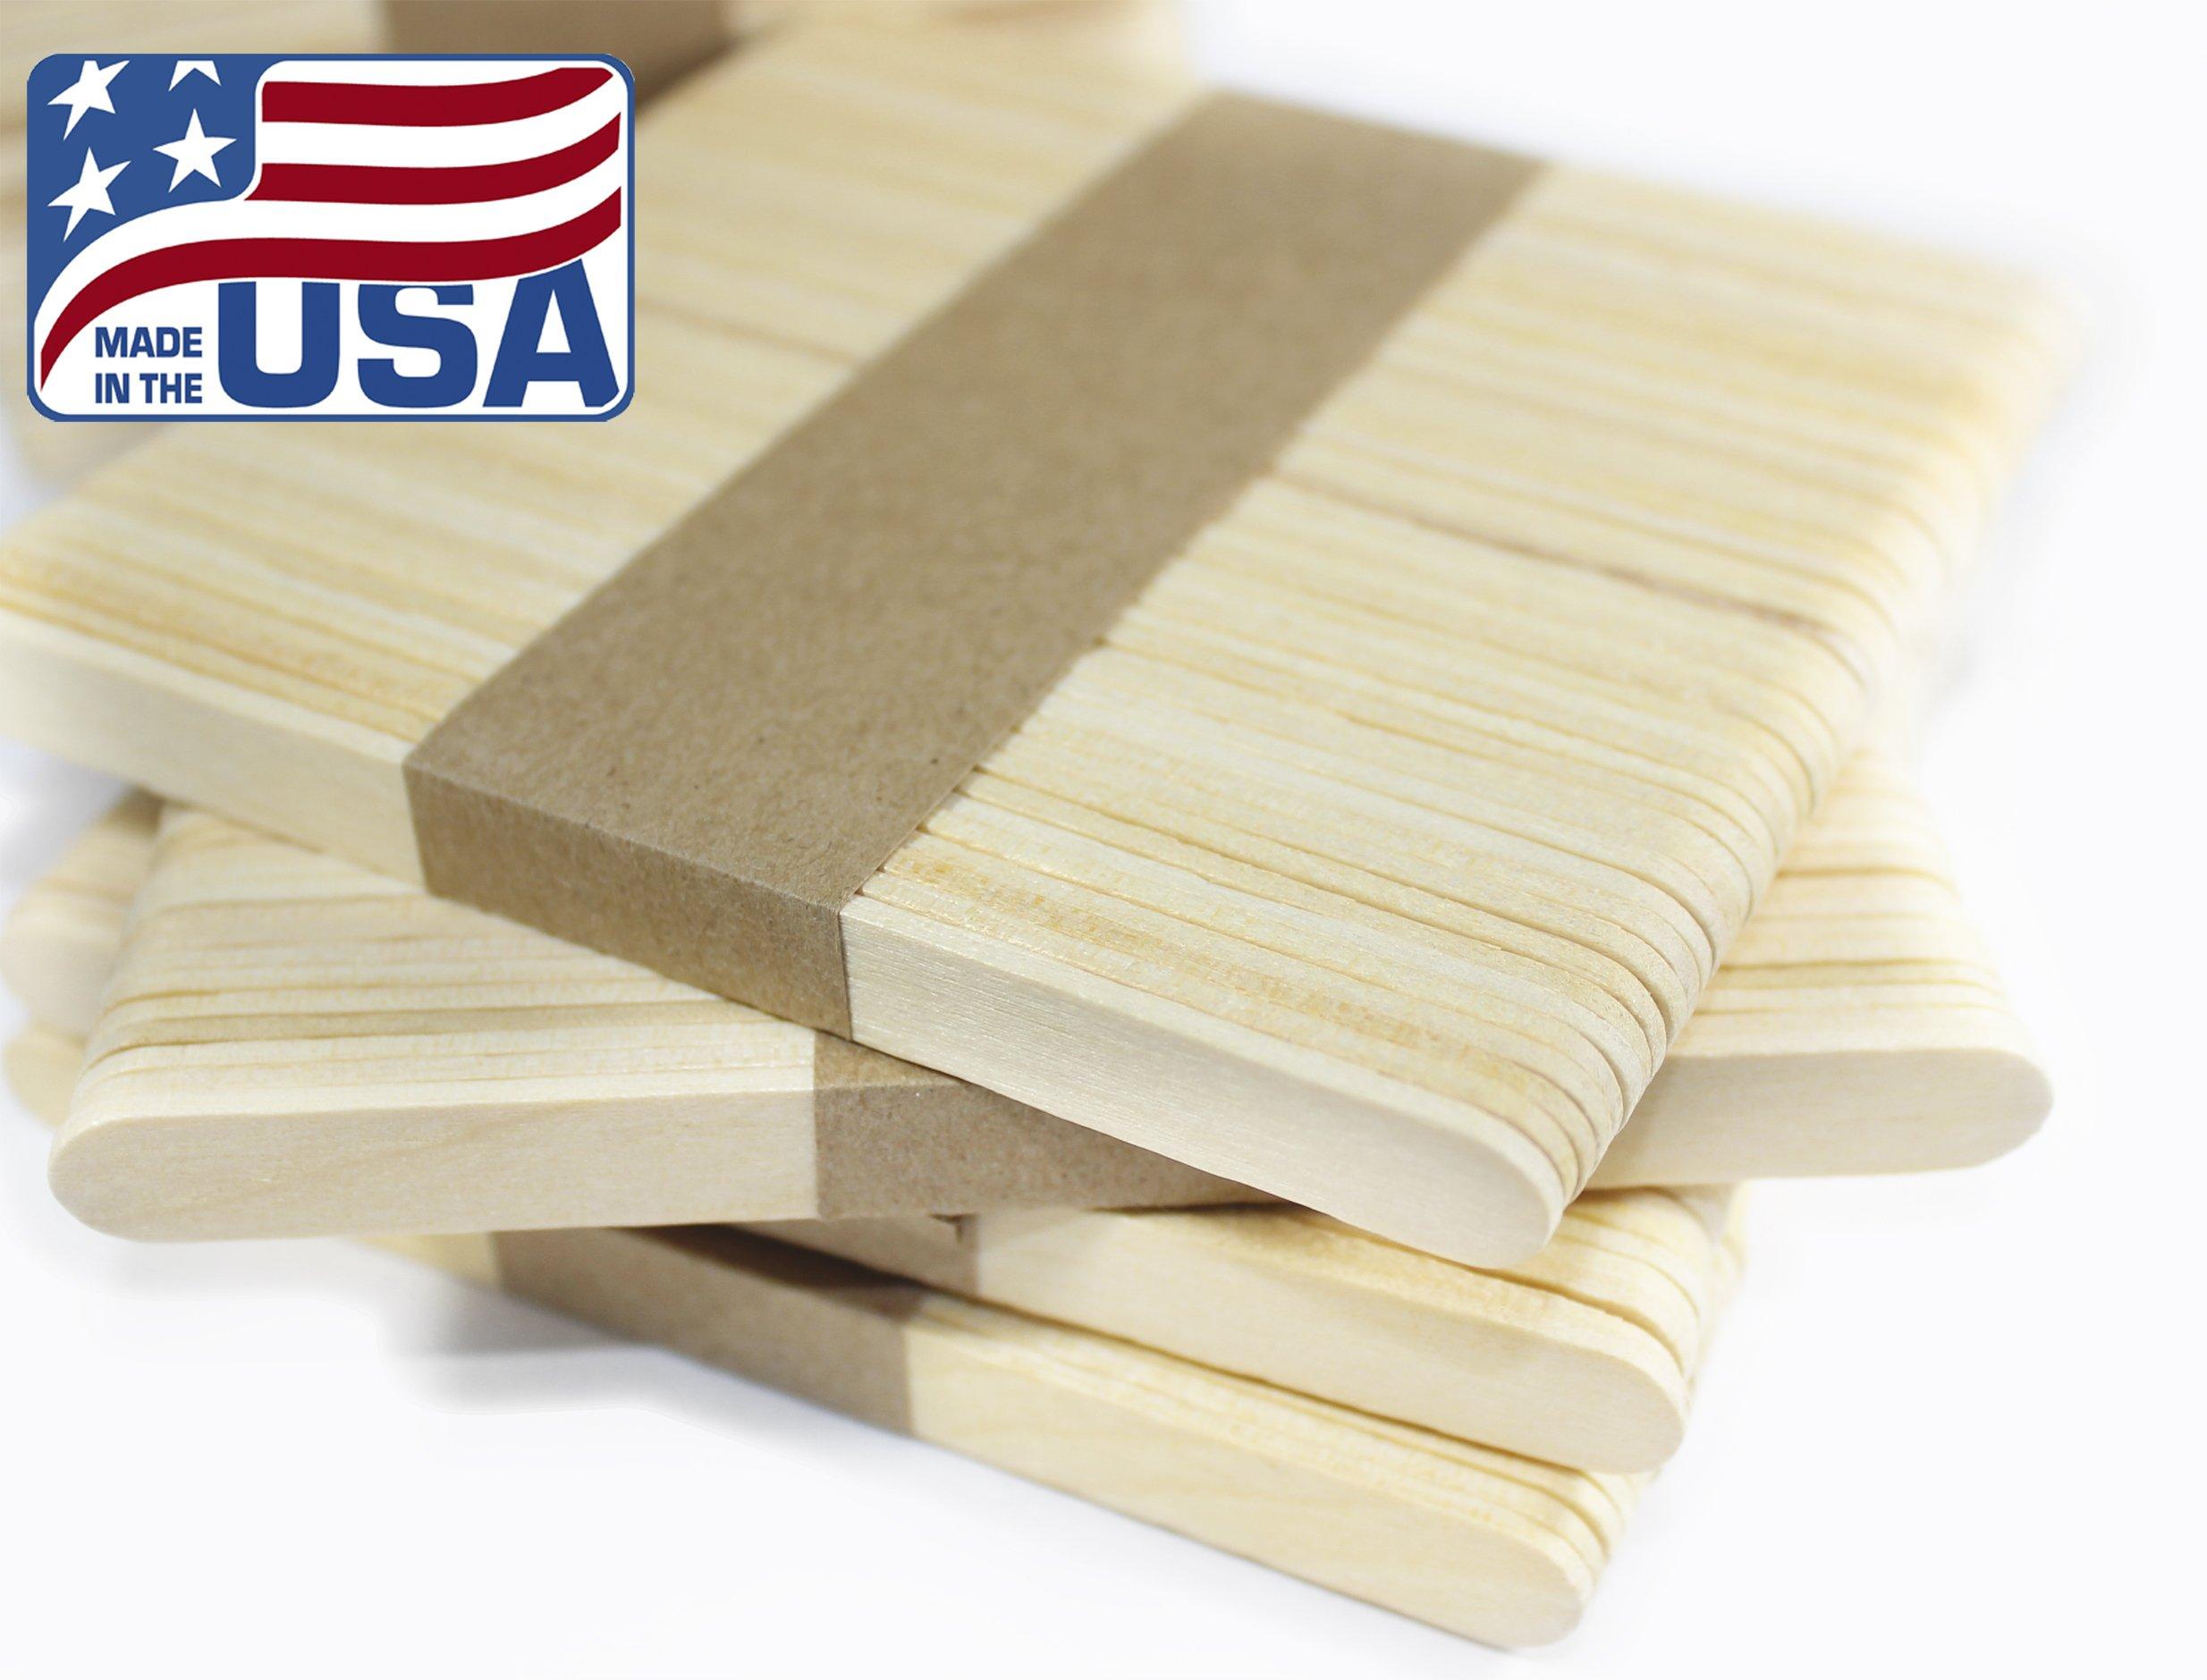 Wooden Ice Cream Stick • Popsicle Stick • Caramel Apple Stick • Crafts Stick • Wooden Treat Sticks • Building Model (200)